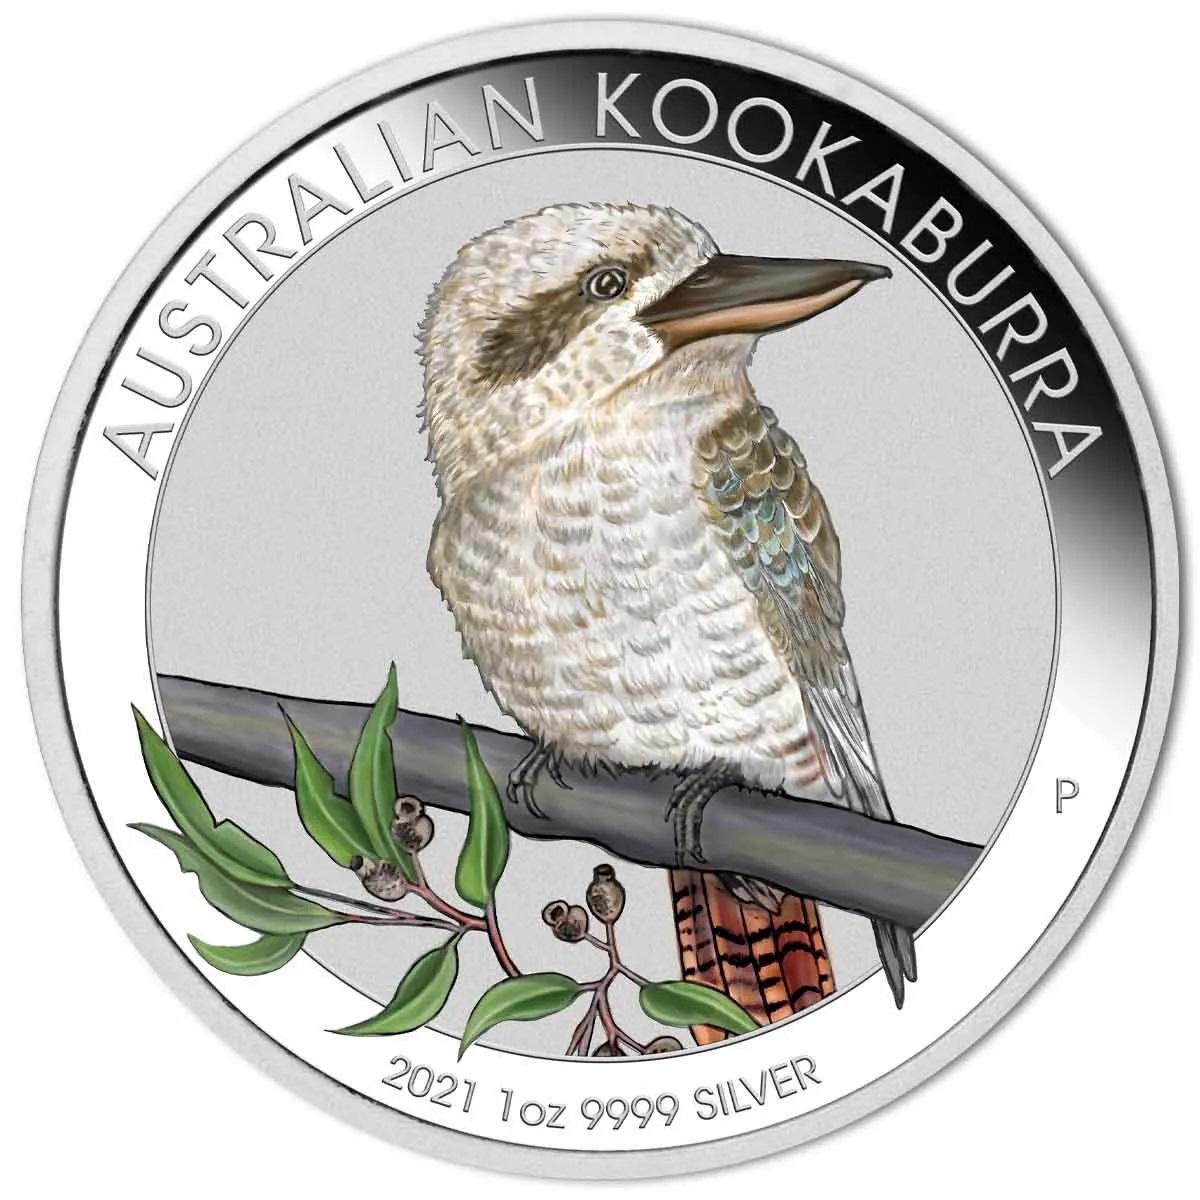 Австралия монета 1 доллар кукабара, реверс